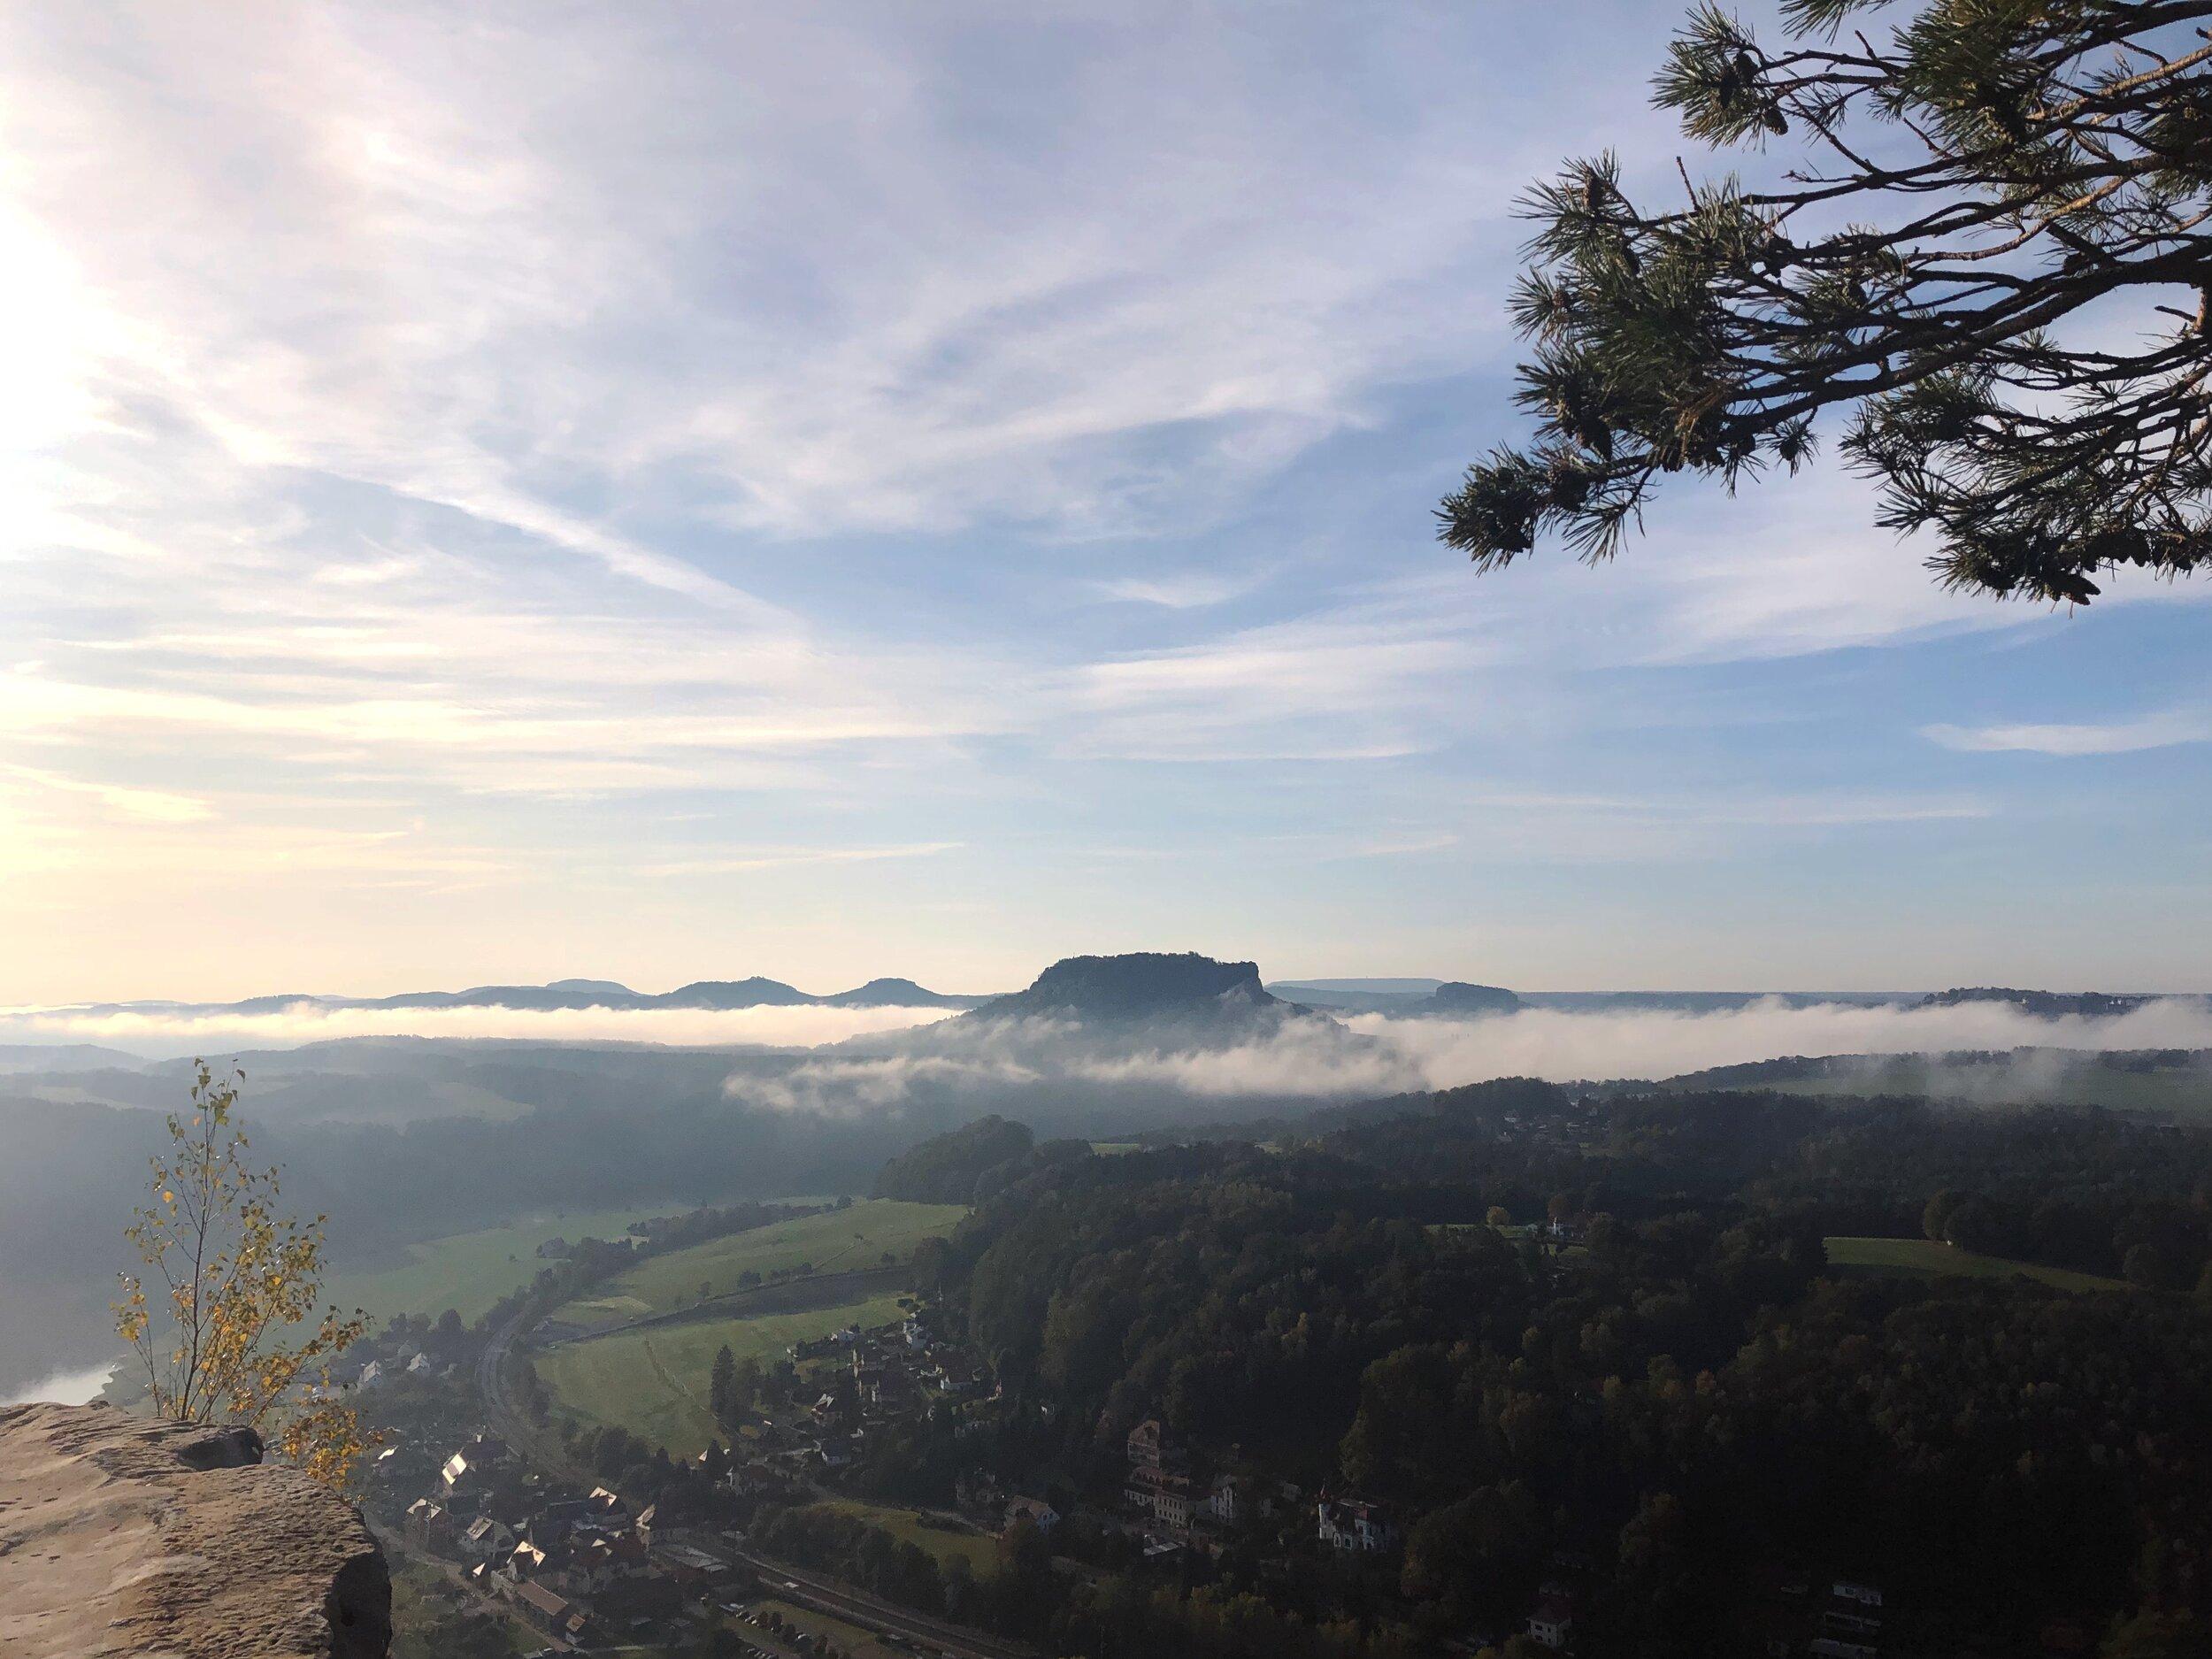 baste-bridge-lohmen-germany-hiking_0330.JPG